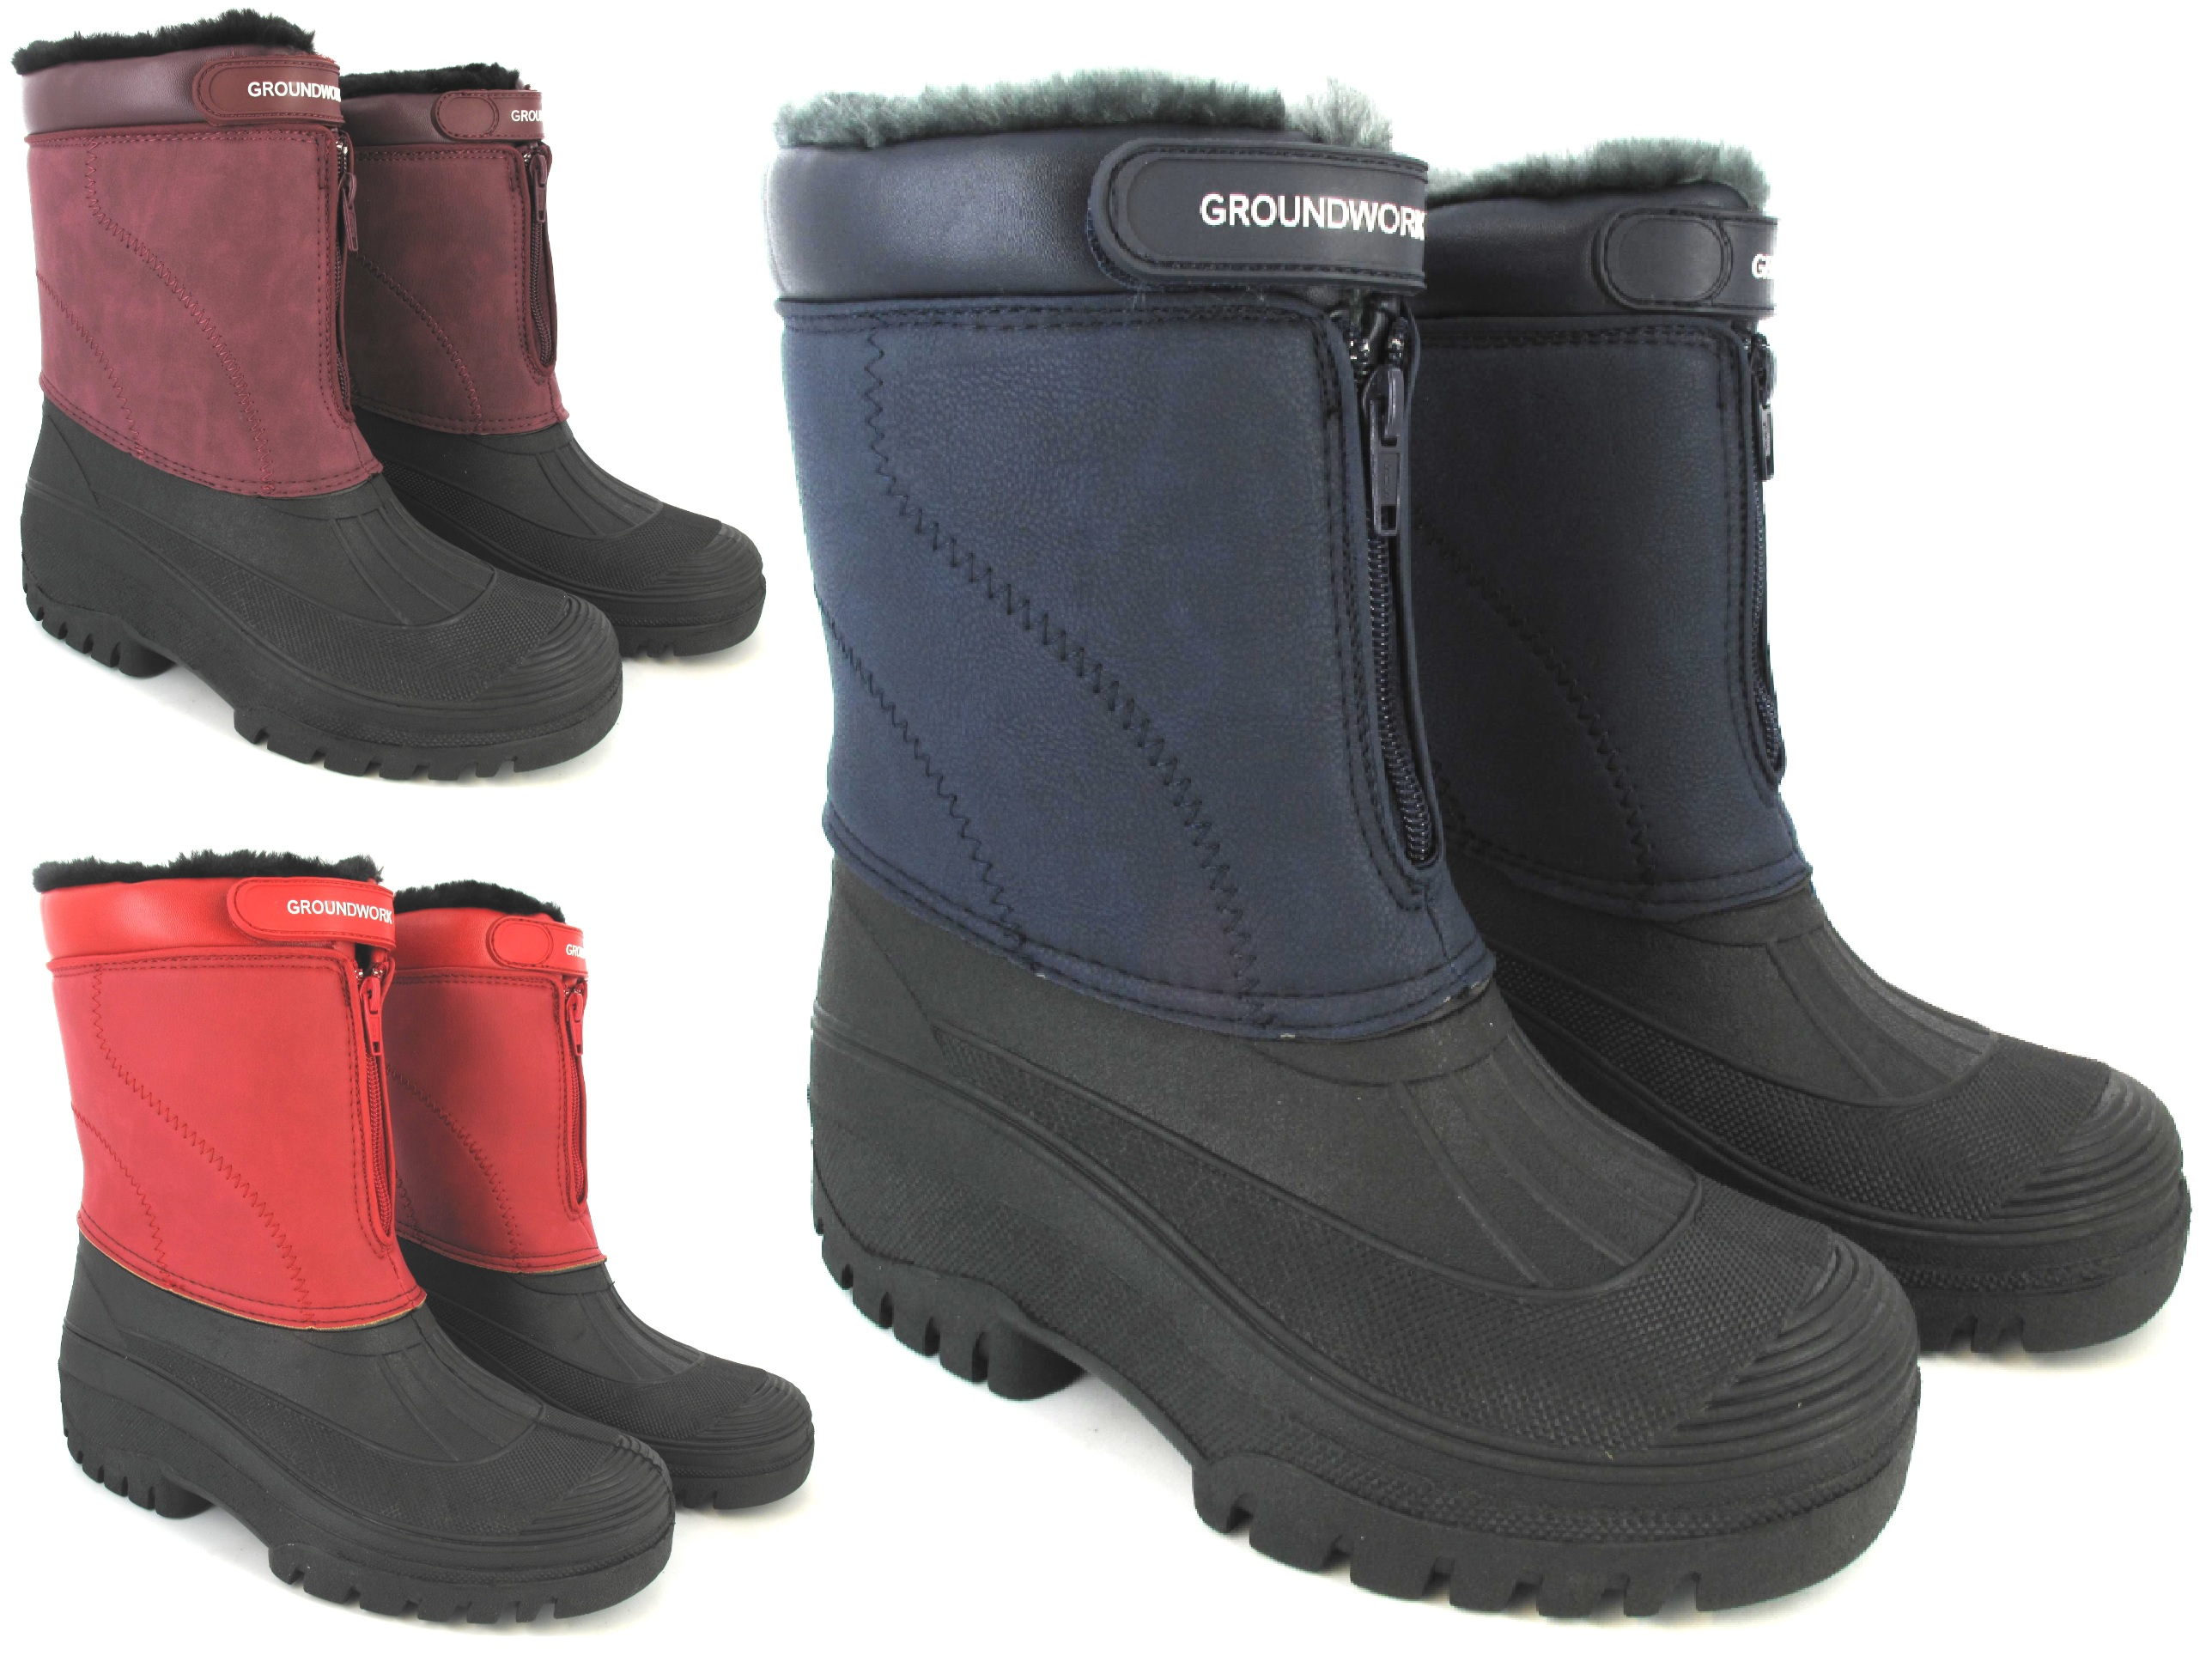 código promocional 6d2f5 0656c Details about Mujer Botas De Nieve Mugrero Impermeable Térmico Agua Piel  Esquí Invierno